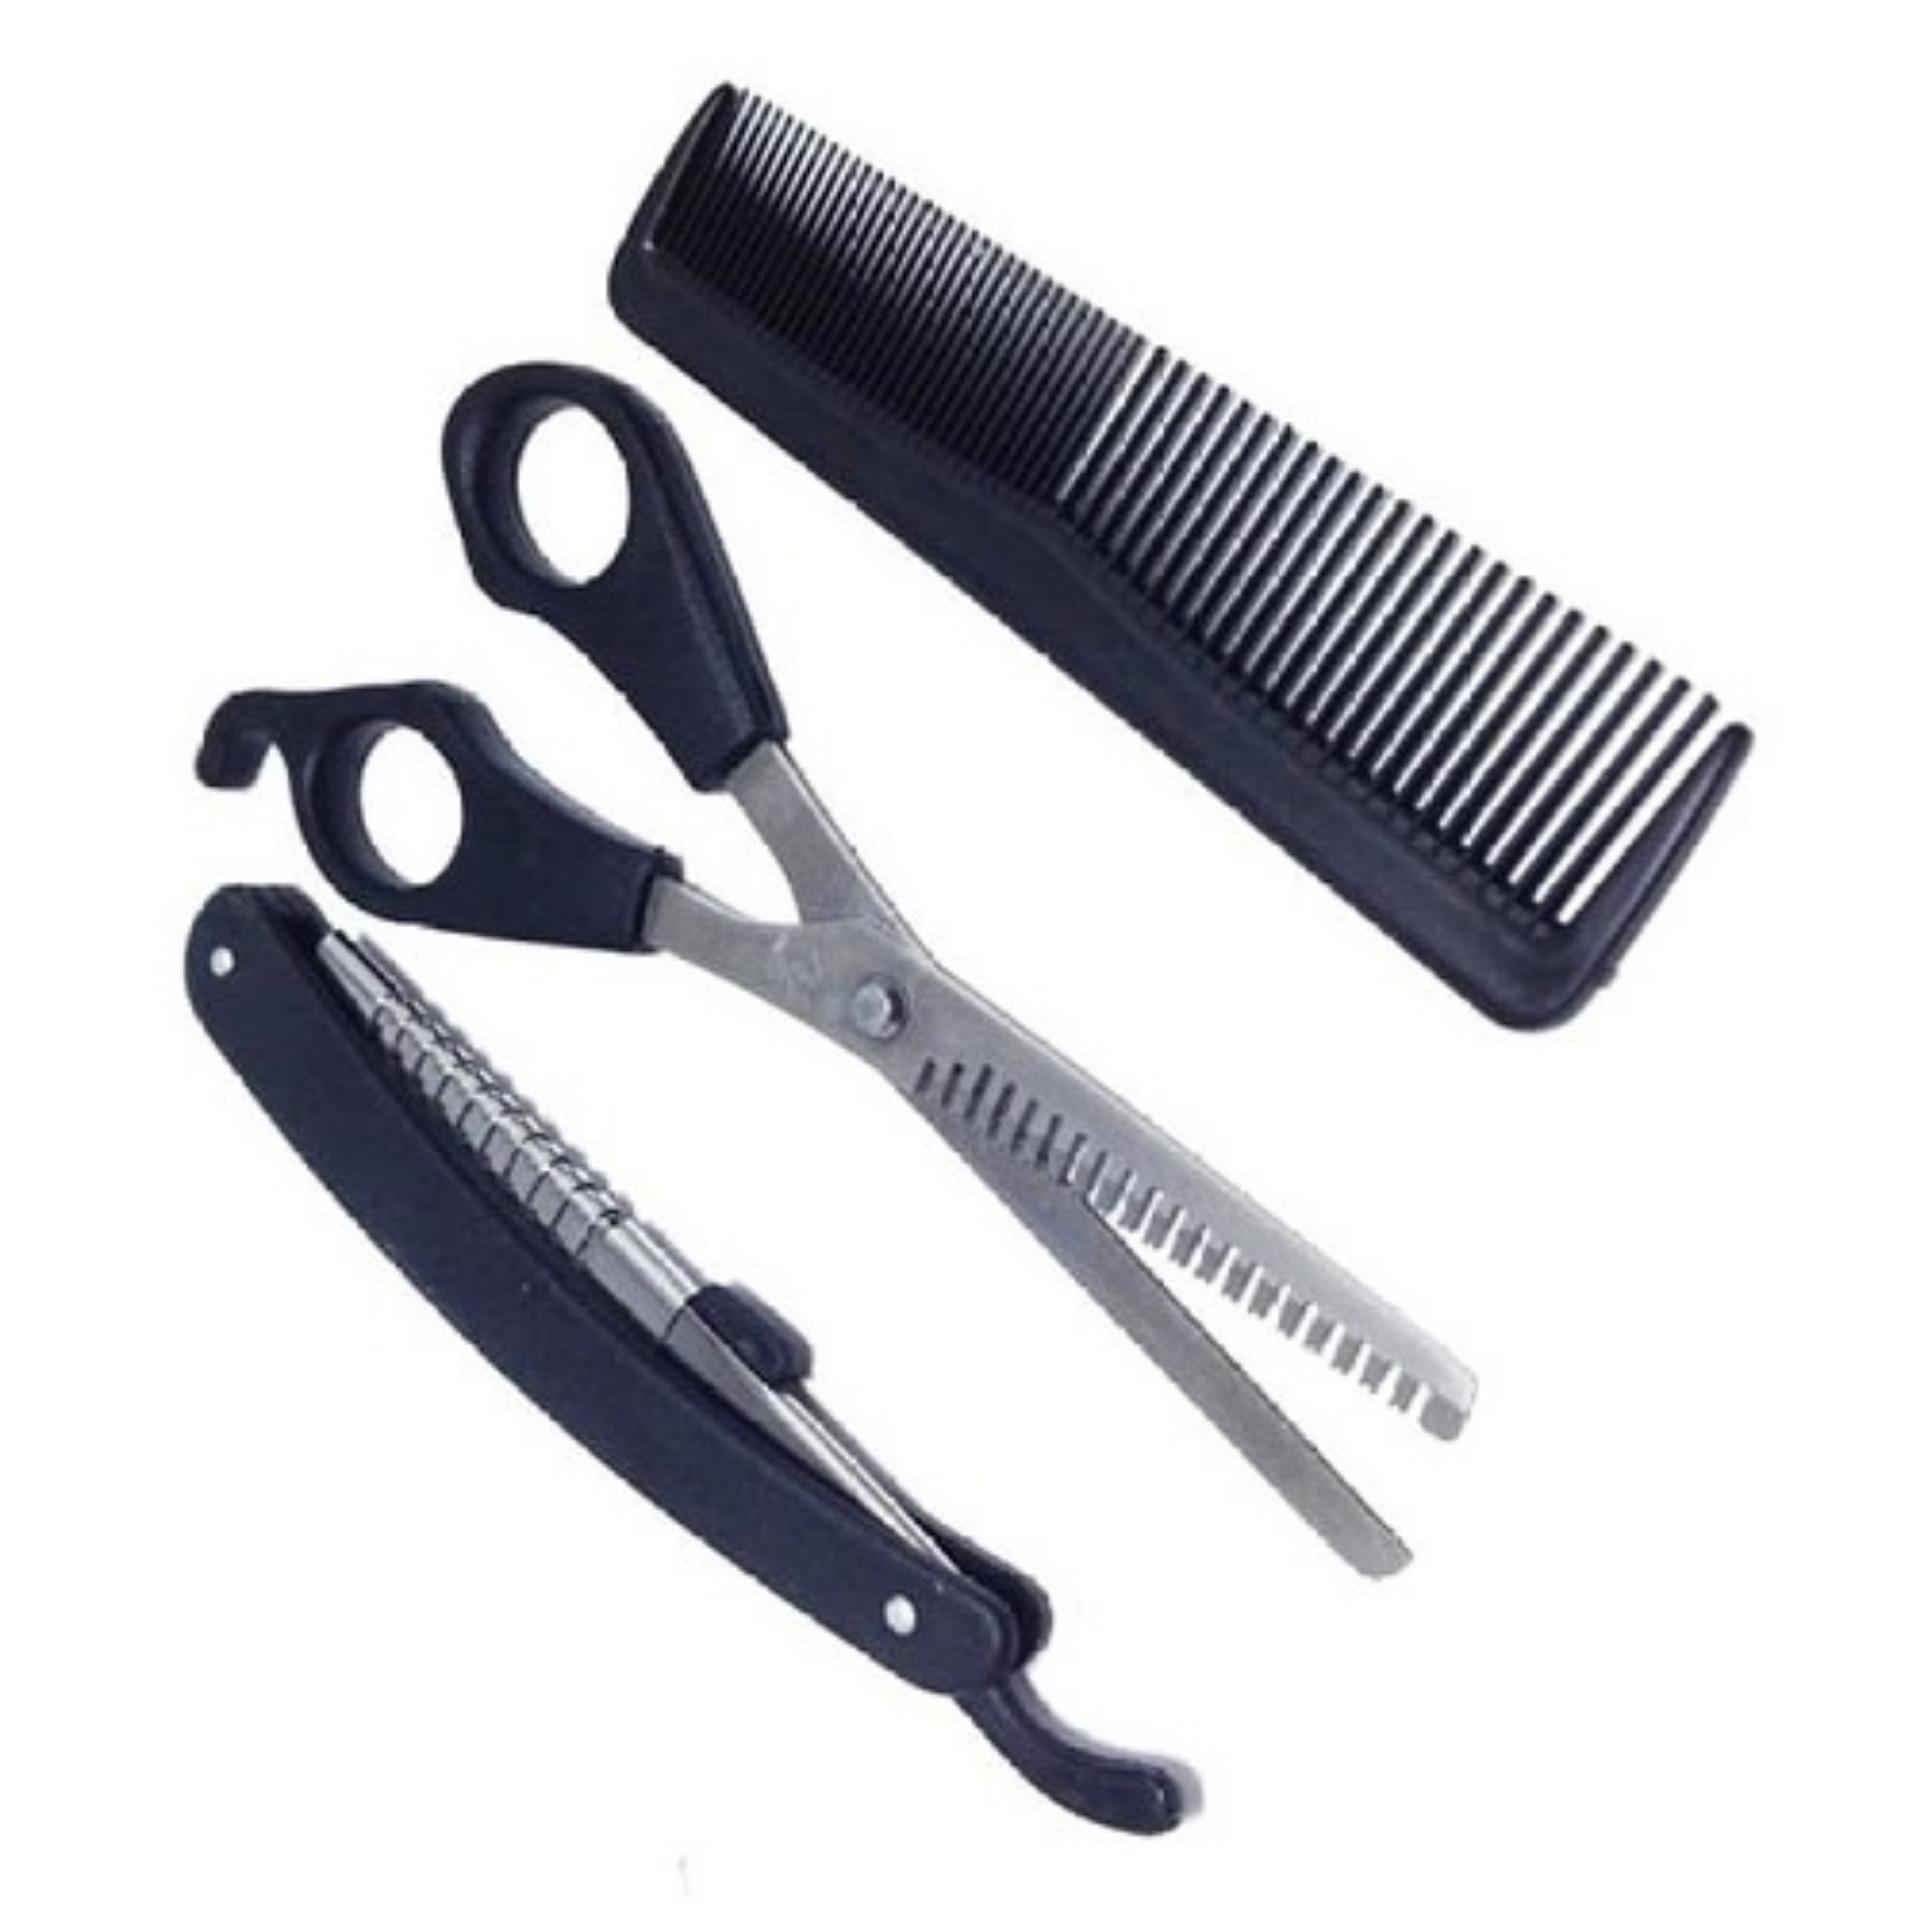 Buy Sell Cheapest Yaoyou Barber Set Best Quality Product Deals Gunting Rambut Ae0794 Sasak Plus Pisau Cukur Lipat Murah